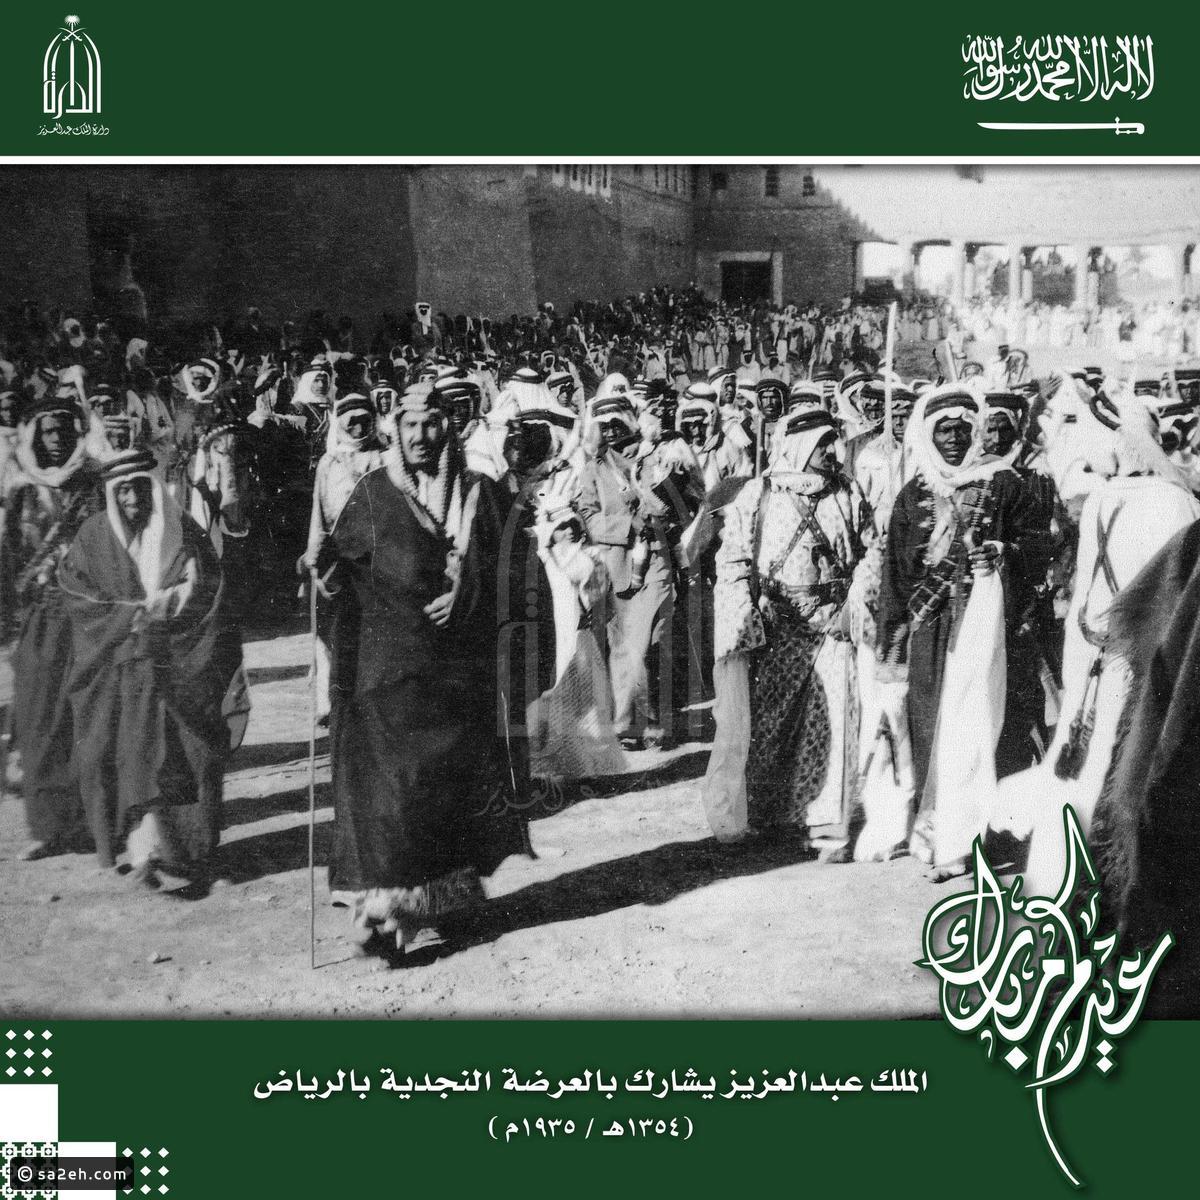 awww.alqiyady.com_site_images_sites_default_files_alqiyady_pro1c683473215f728024578cbffc08e25f.